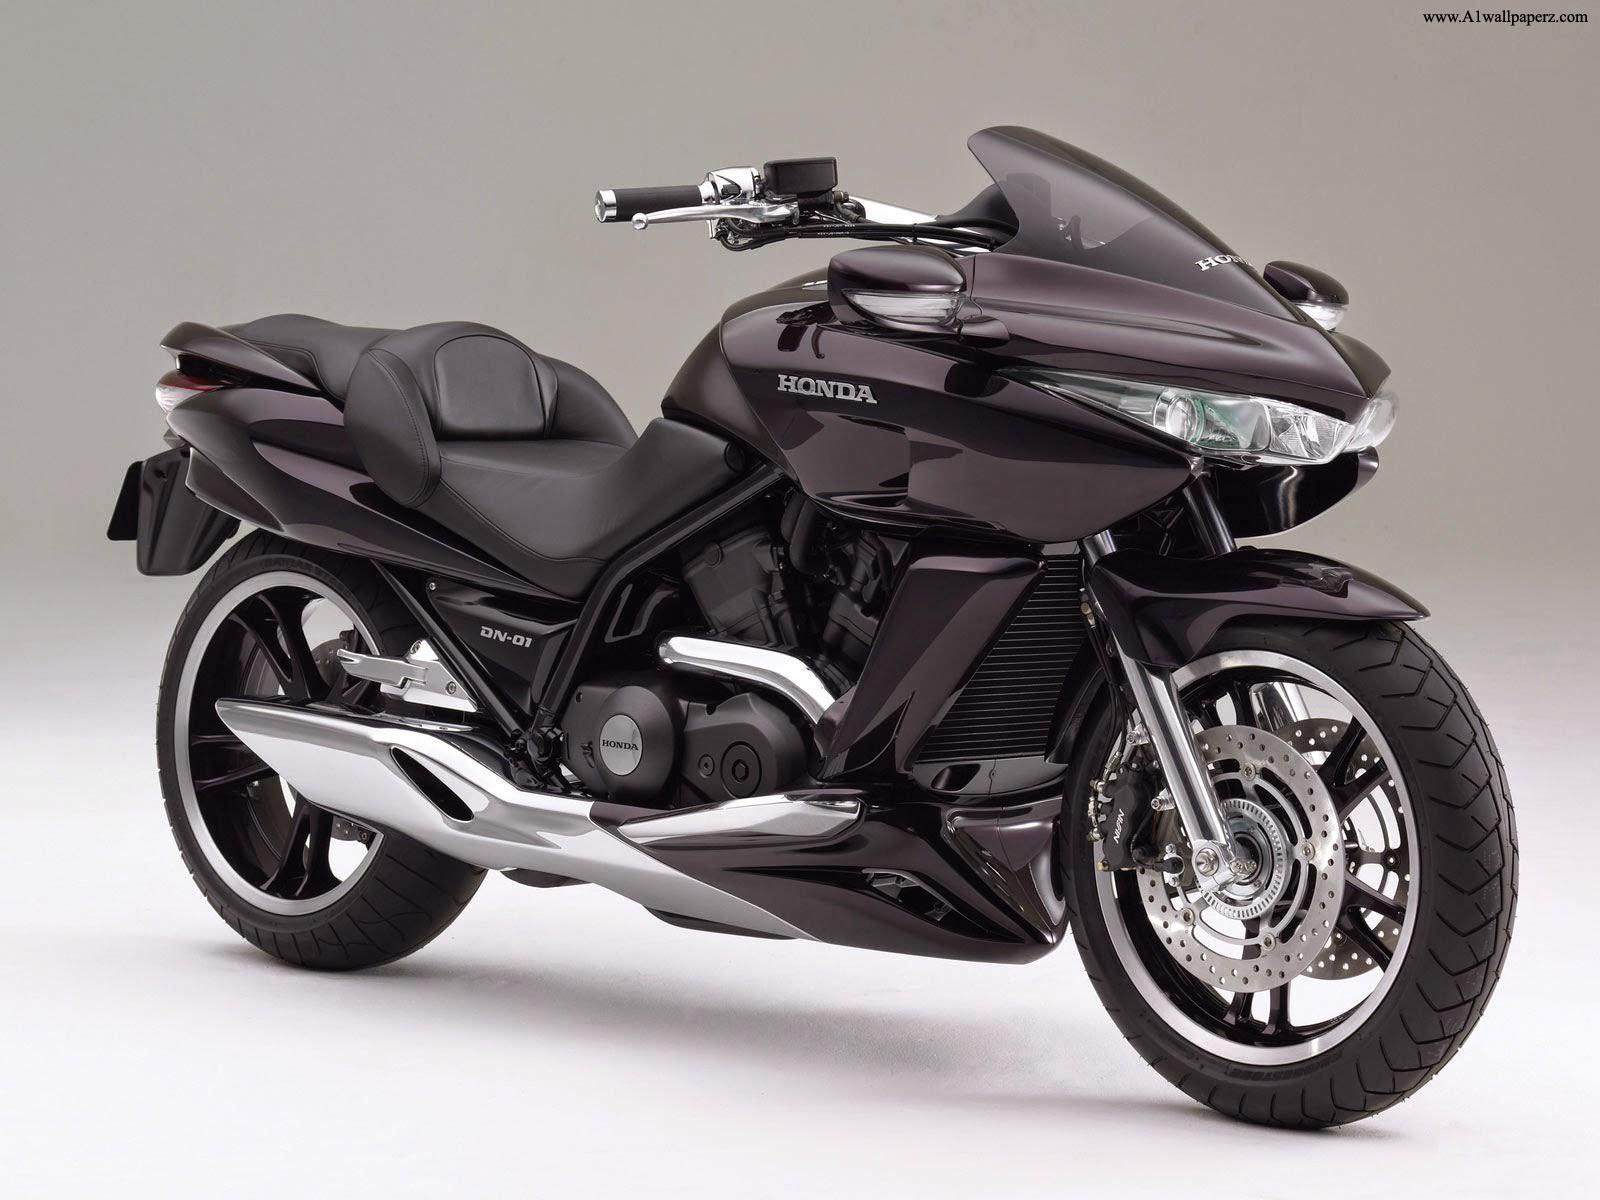 50 Sports Heavy Bikes HD Wallpapers For Desktop Mobile A1